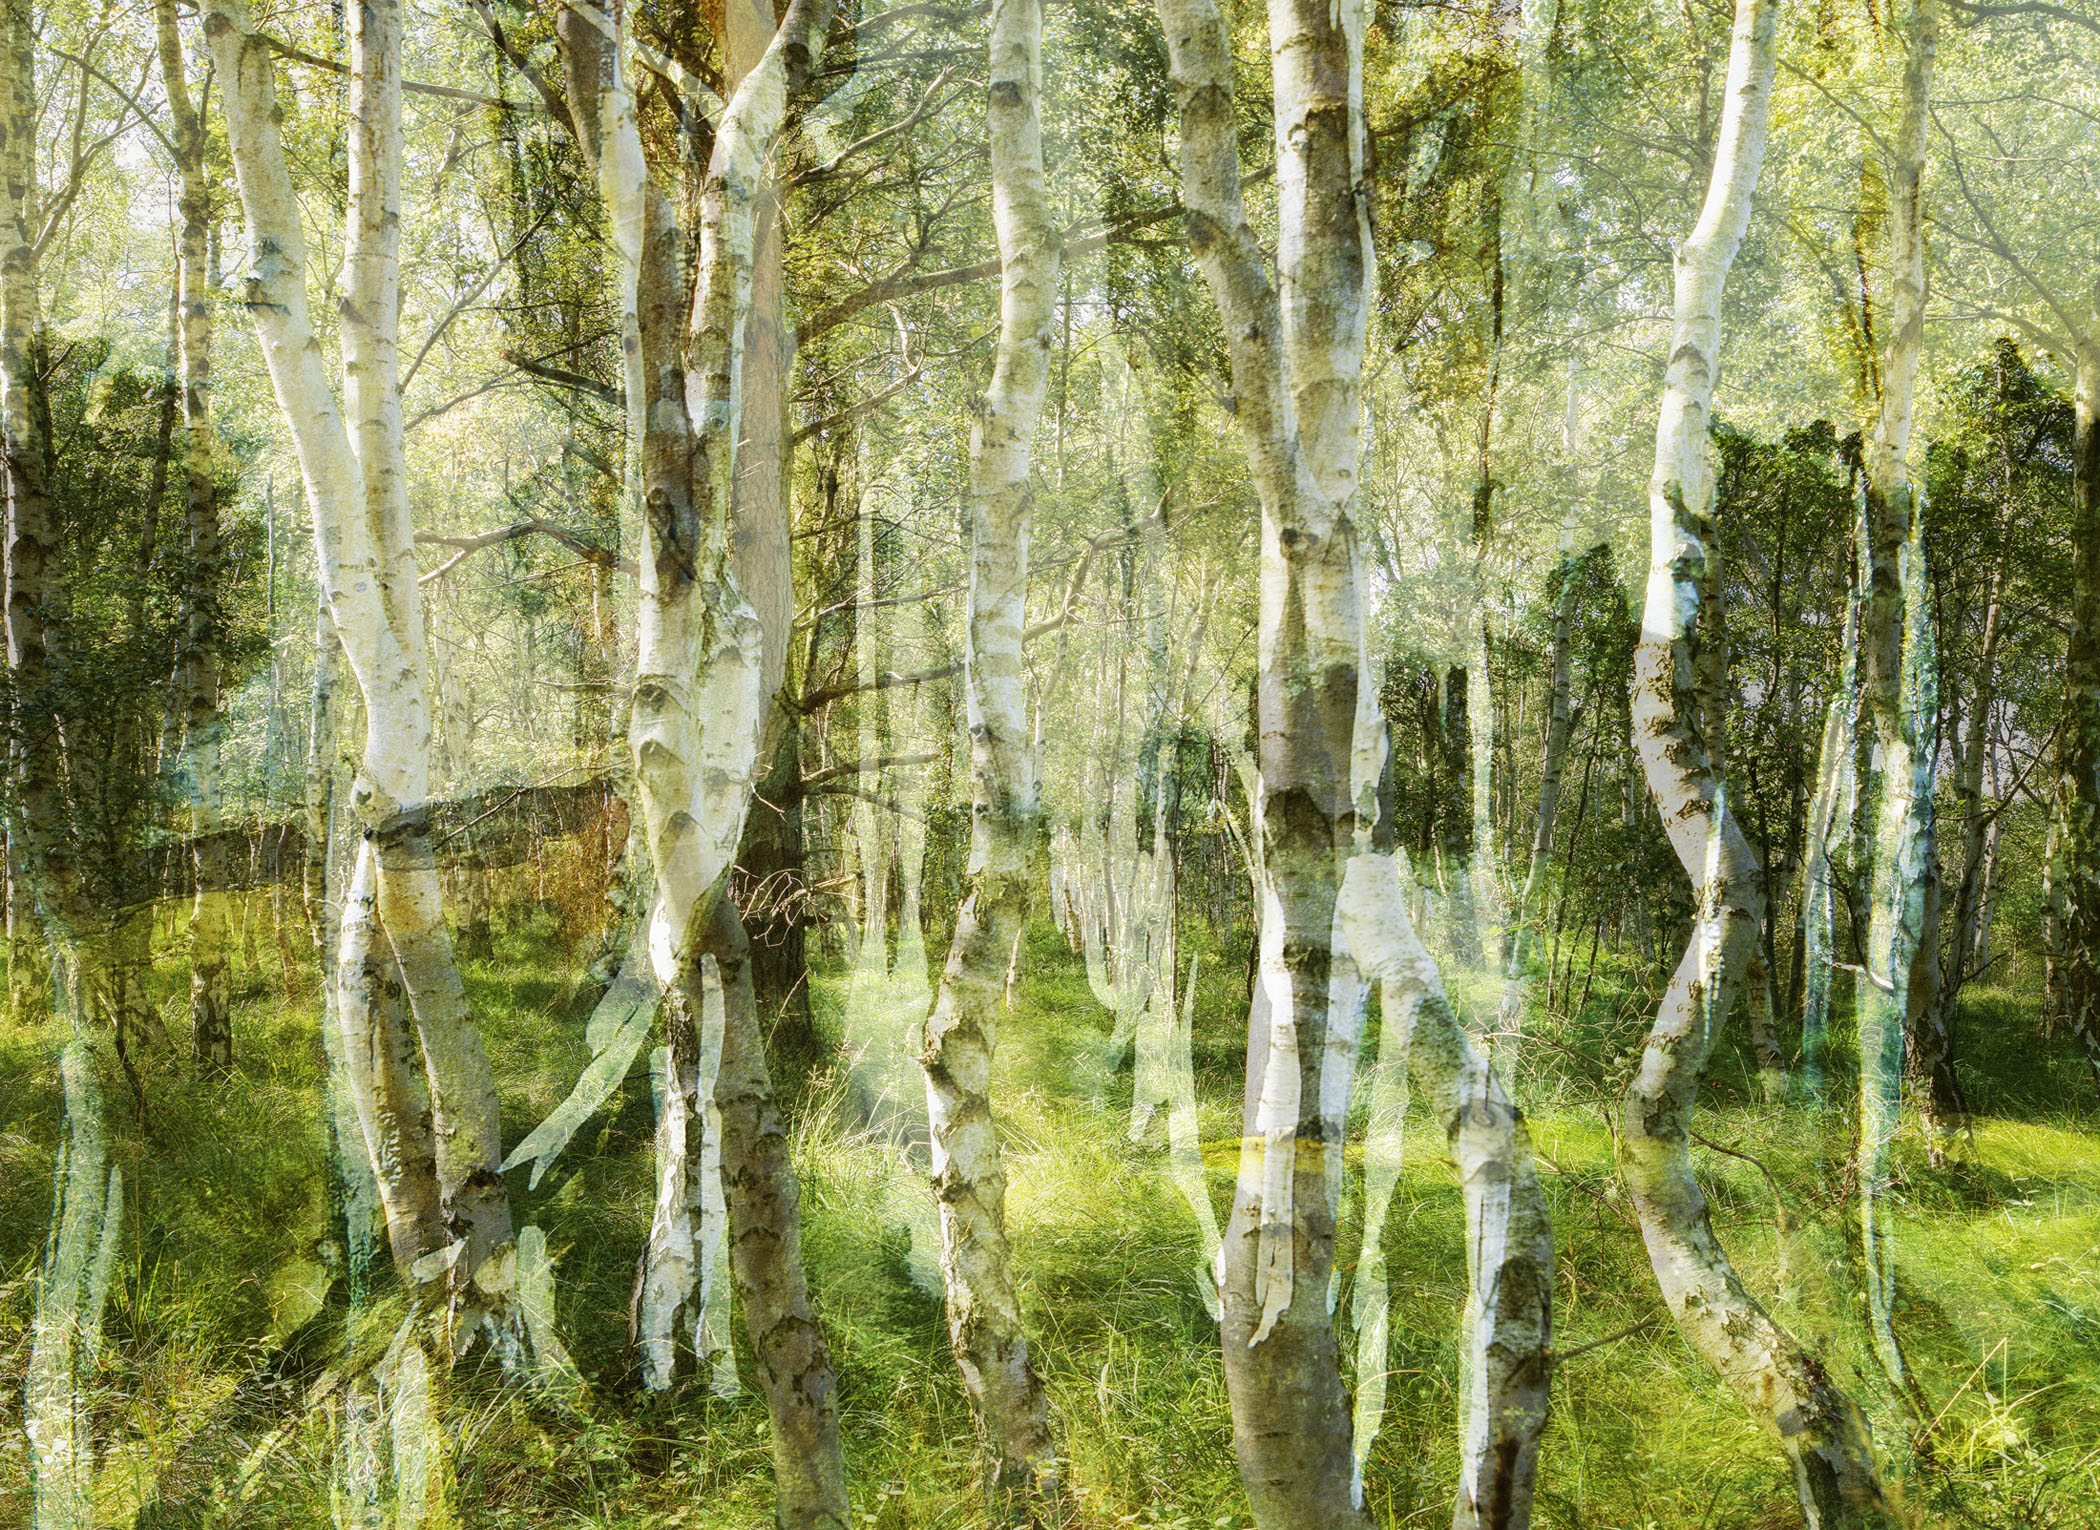 Birkenhain, 2014, C-print, 160 x 220 cm.